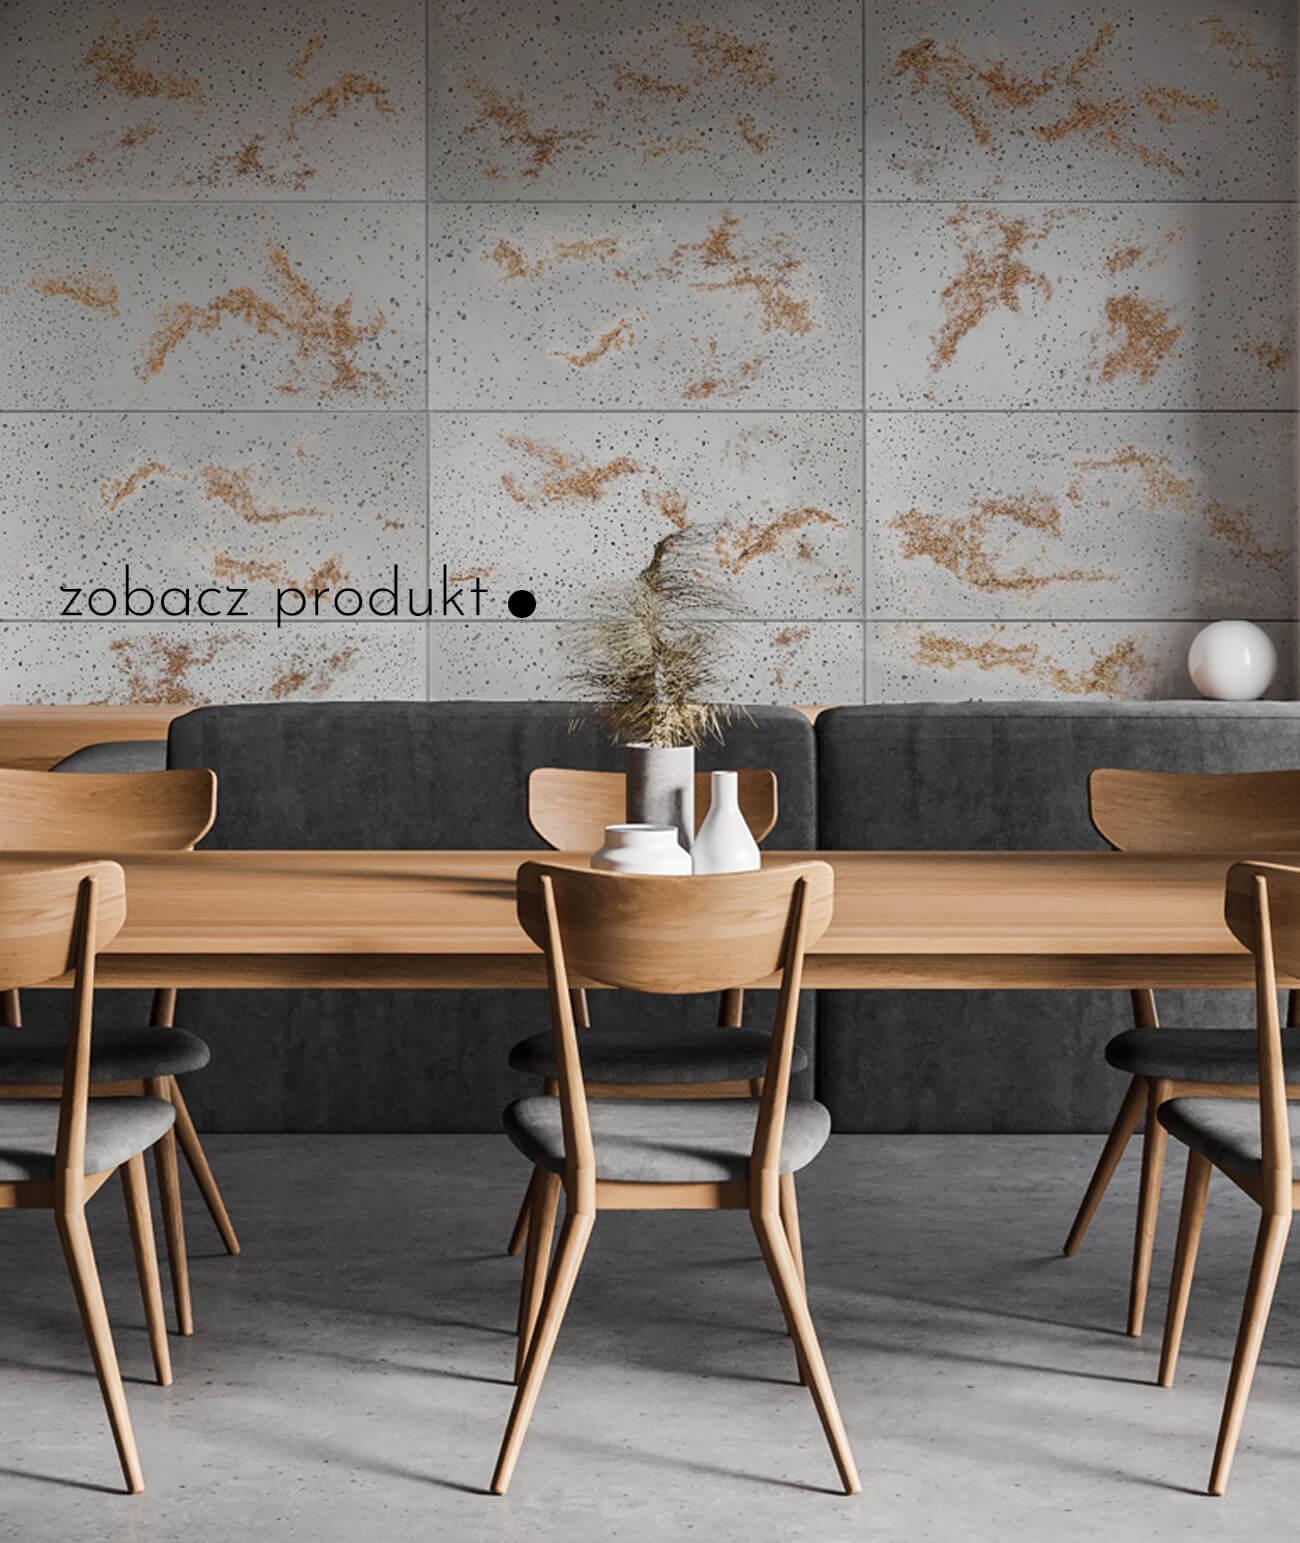 """1140-24311-ds-jasny-szary-zlote-kruszywo-plyta-beton-architektoniczny-grc-ultralekka"""